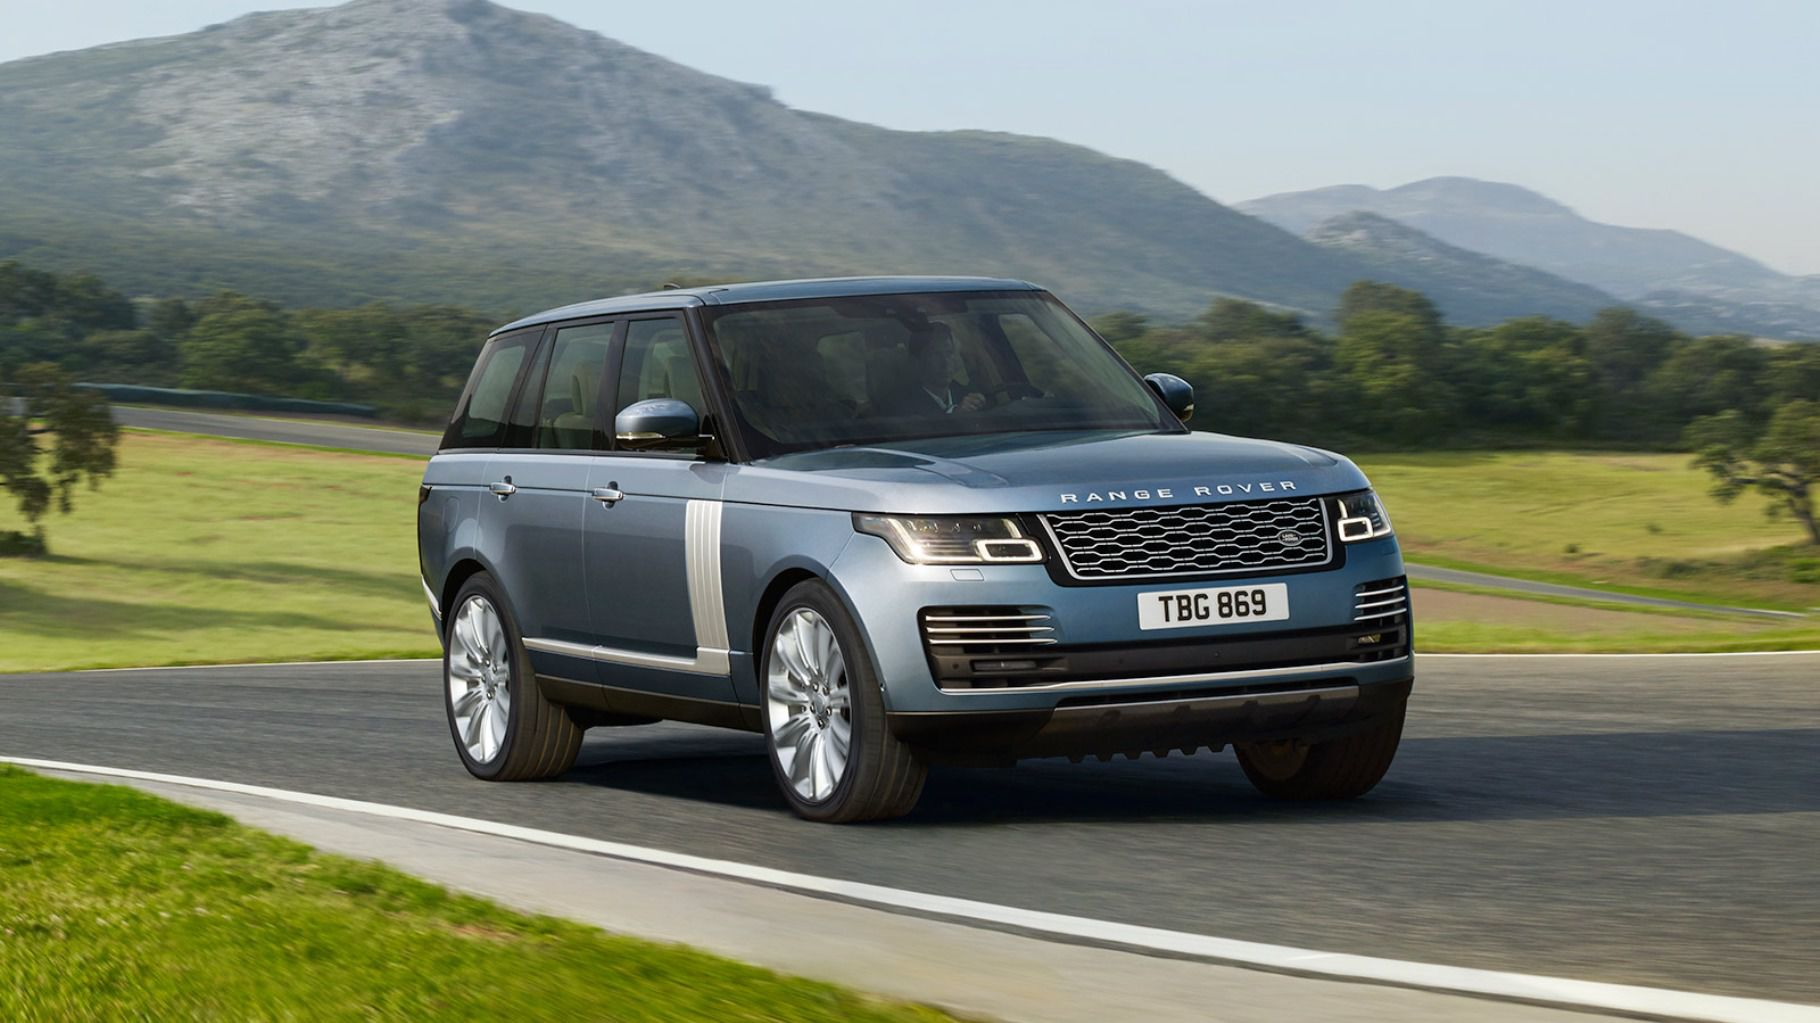 Range Rover - SUV Technology   Land Rover Oman